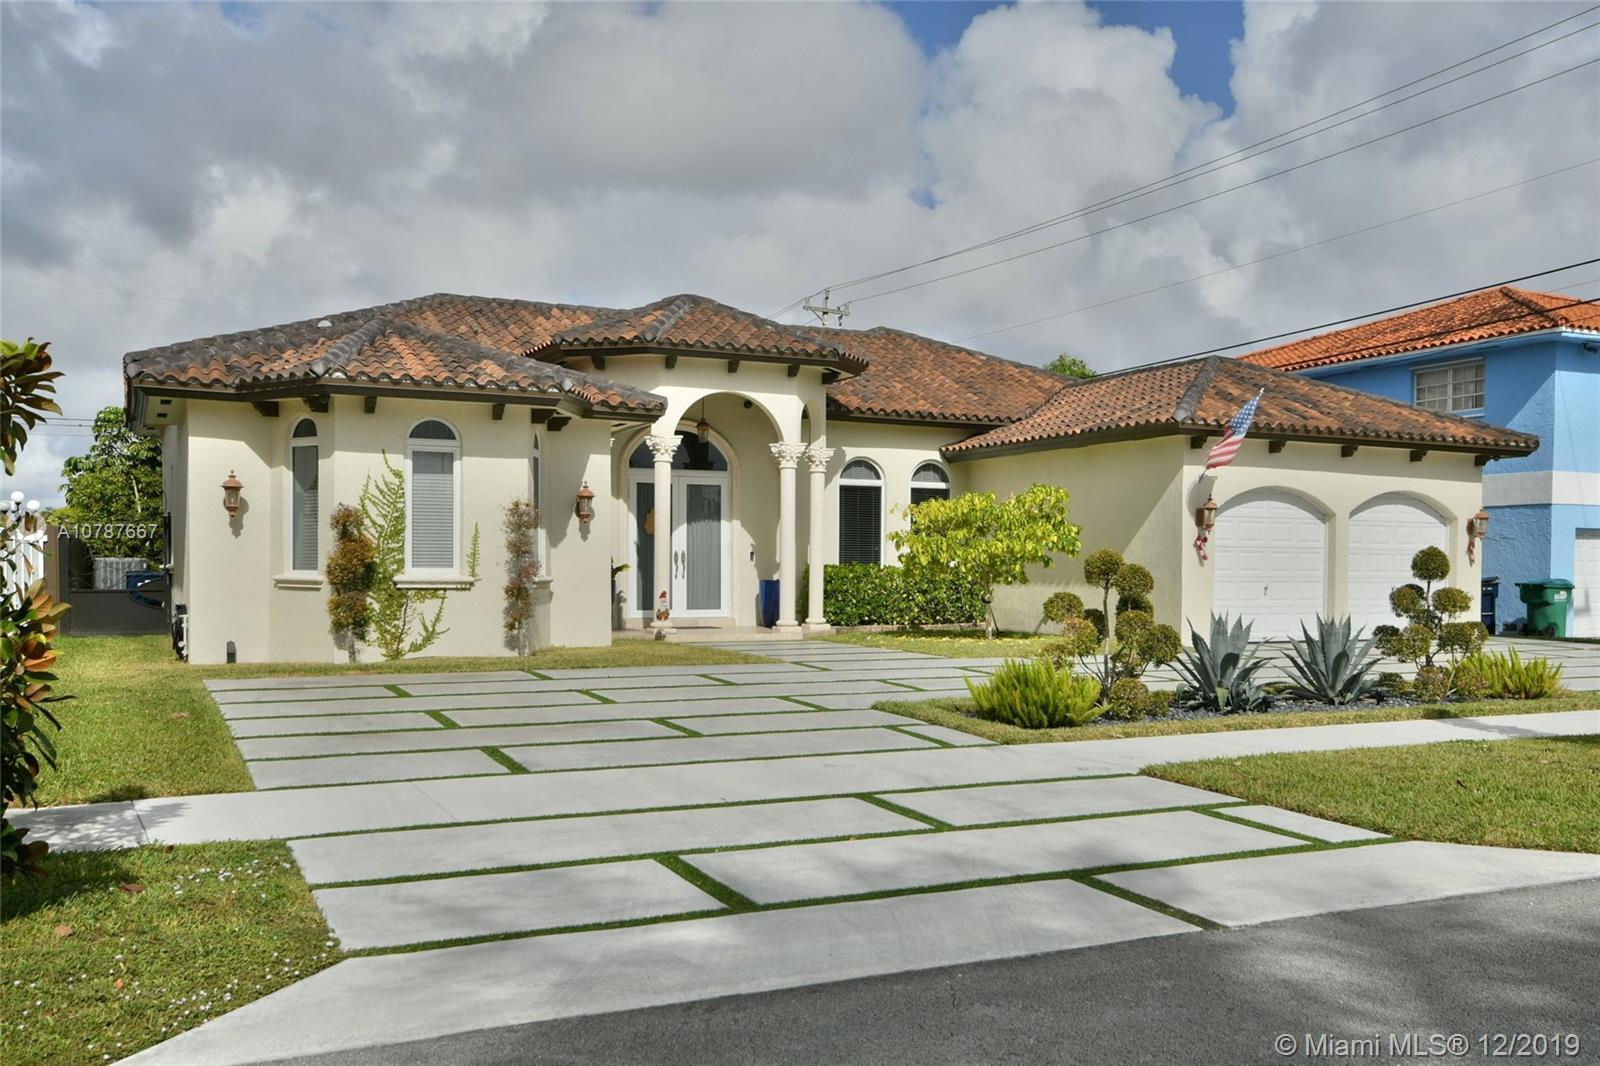 10031 SW 42nd Ter, Miami, FL 33165